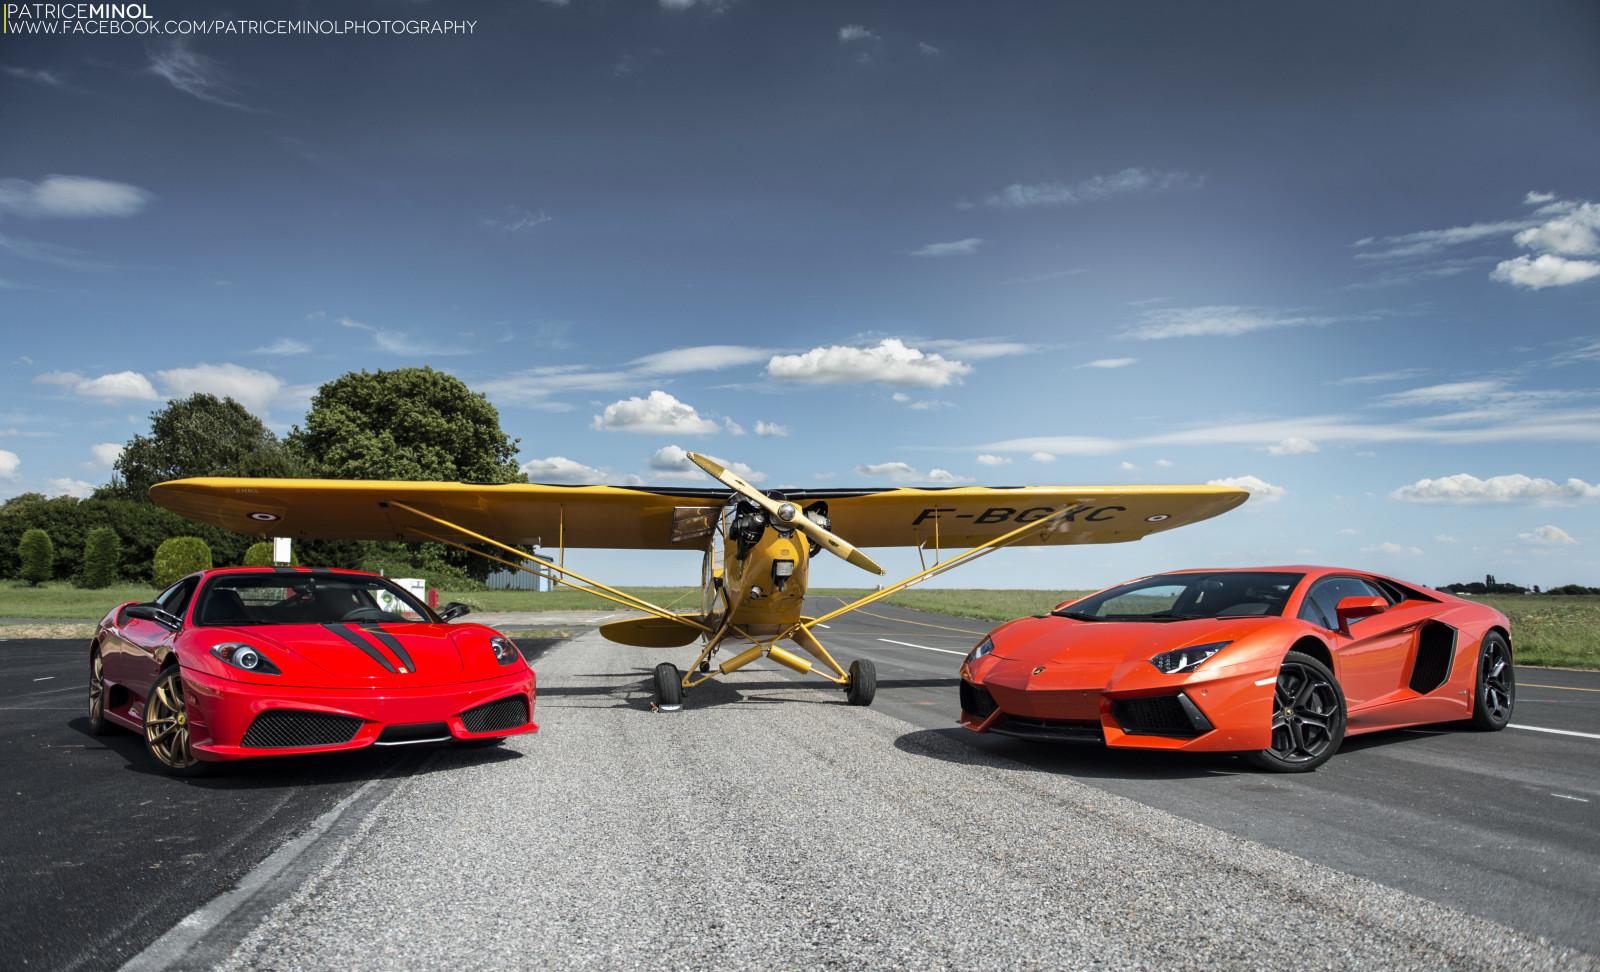 Wallpaper : Road, Supercars, Yellow, Lamborghini Aventador, France, Lamborghini  Gallardo, Sports Car, Ferrari, Asphalt, Coupe, F430, Performance Car, Engine  ...